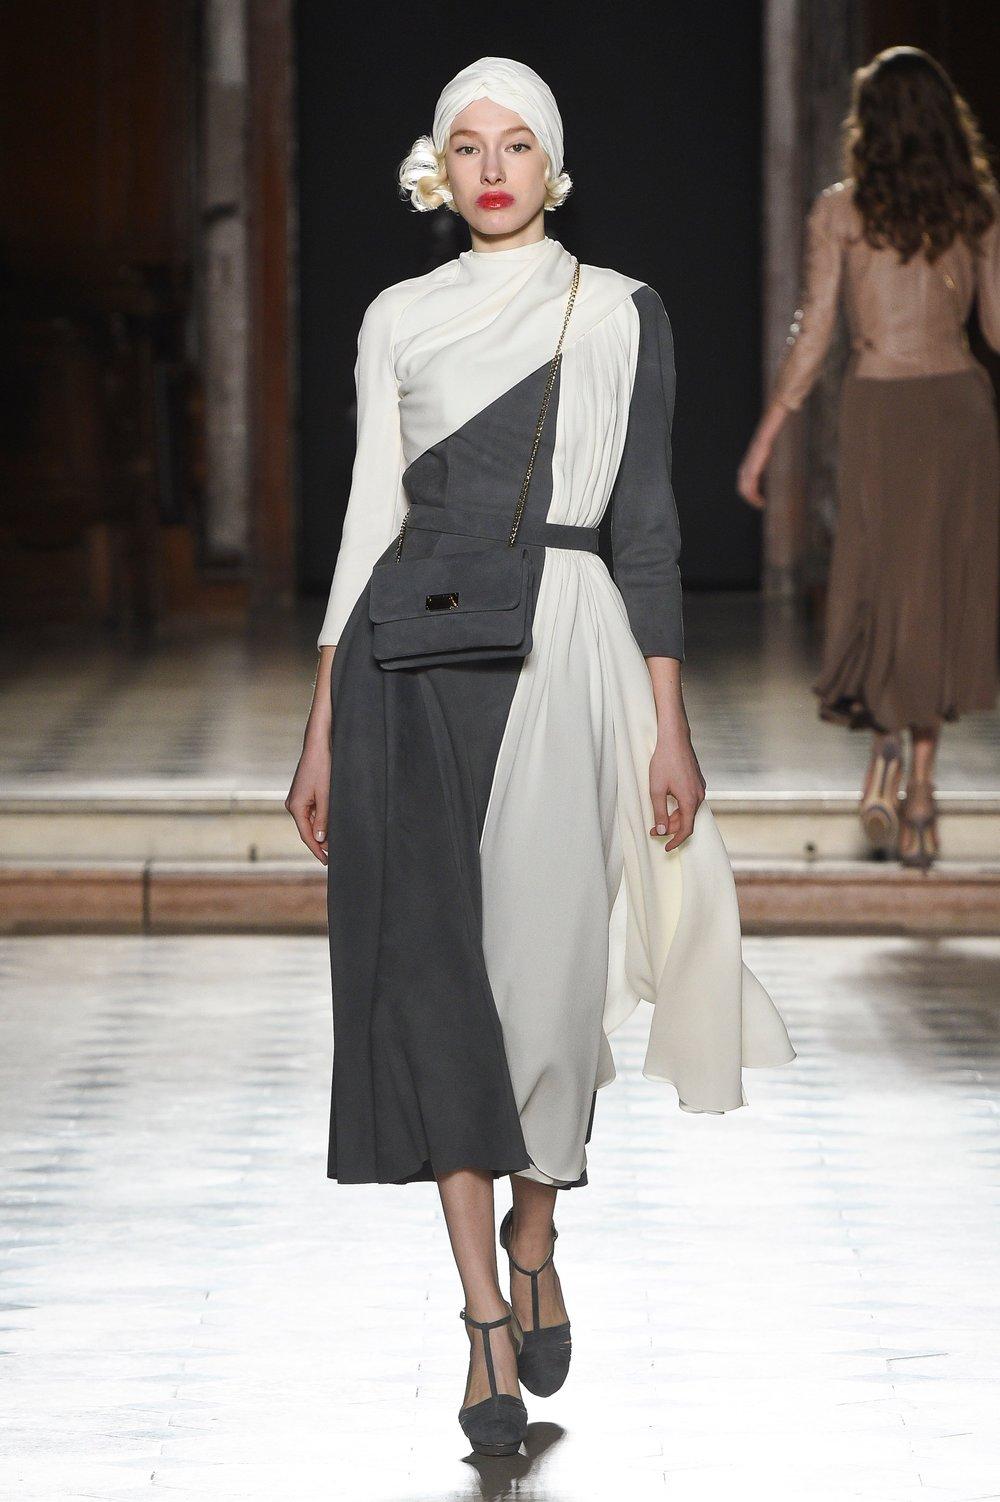 julien_fournie_SS19_couture-14.jpg